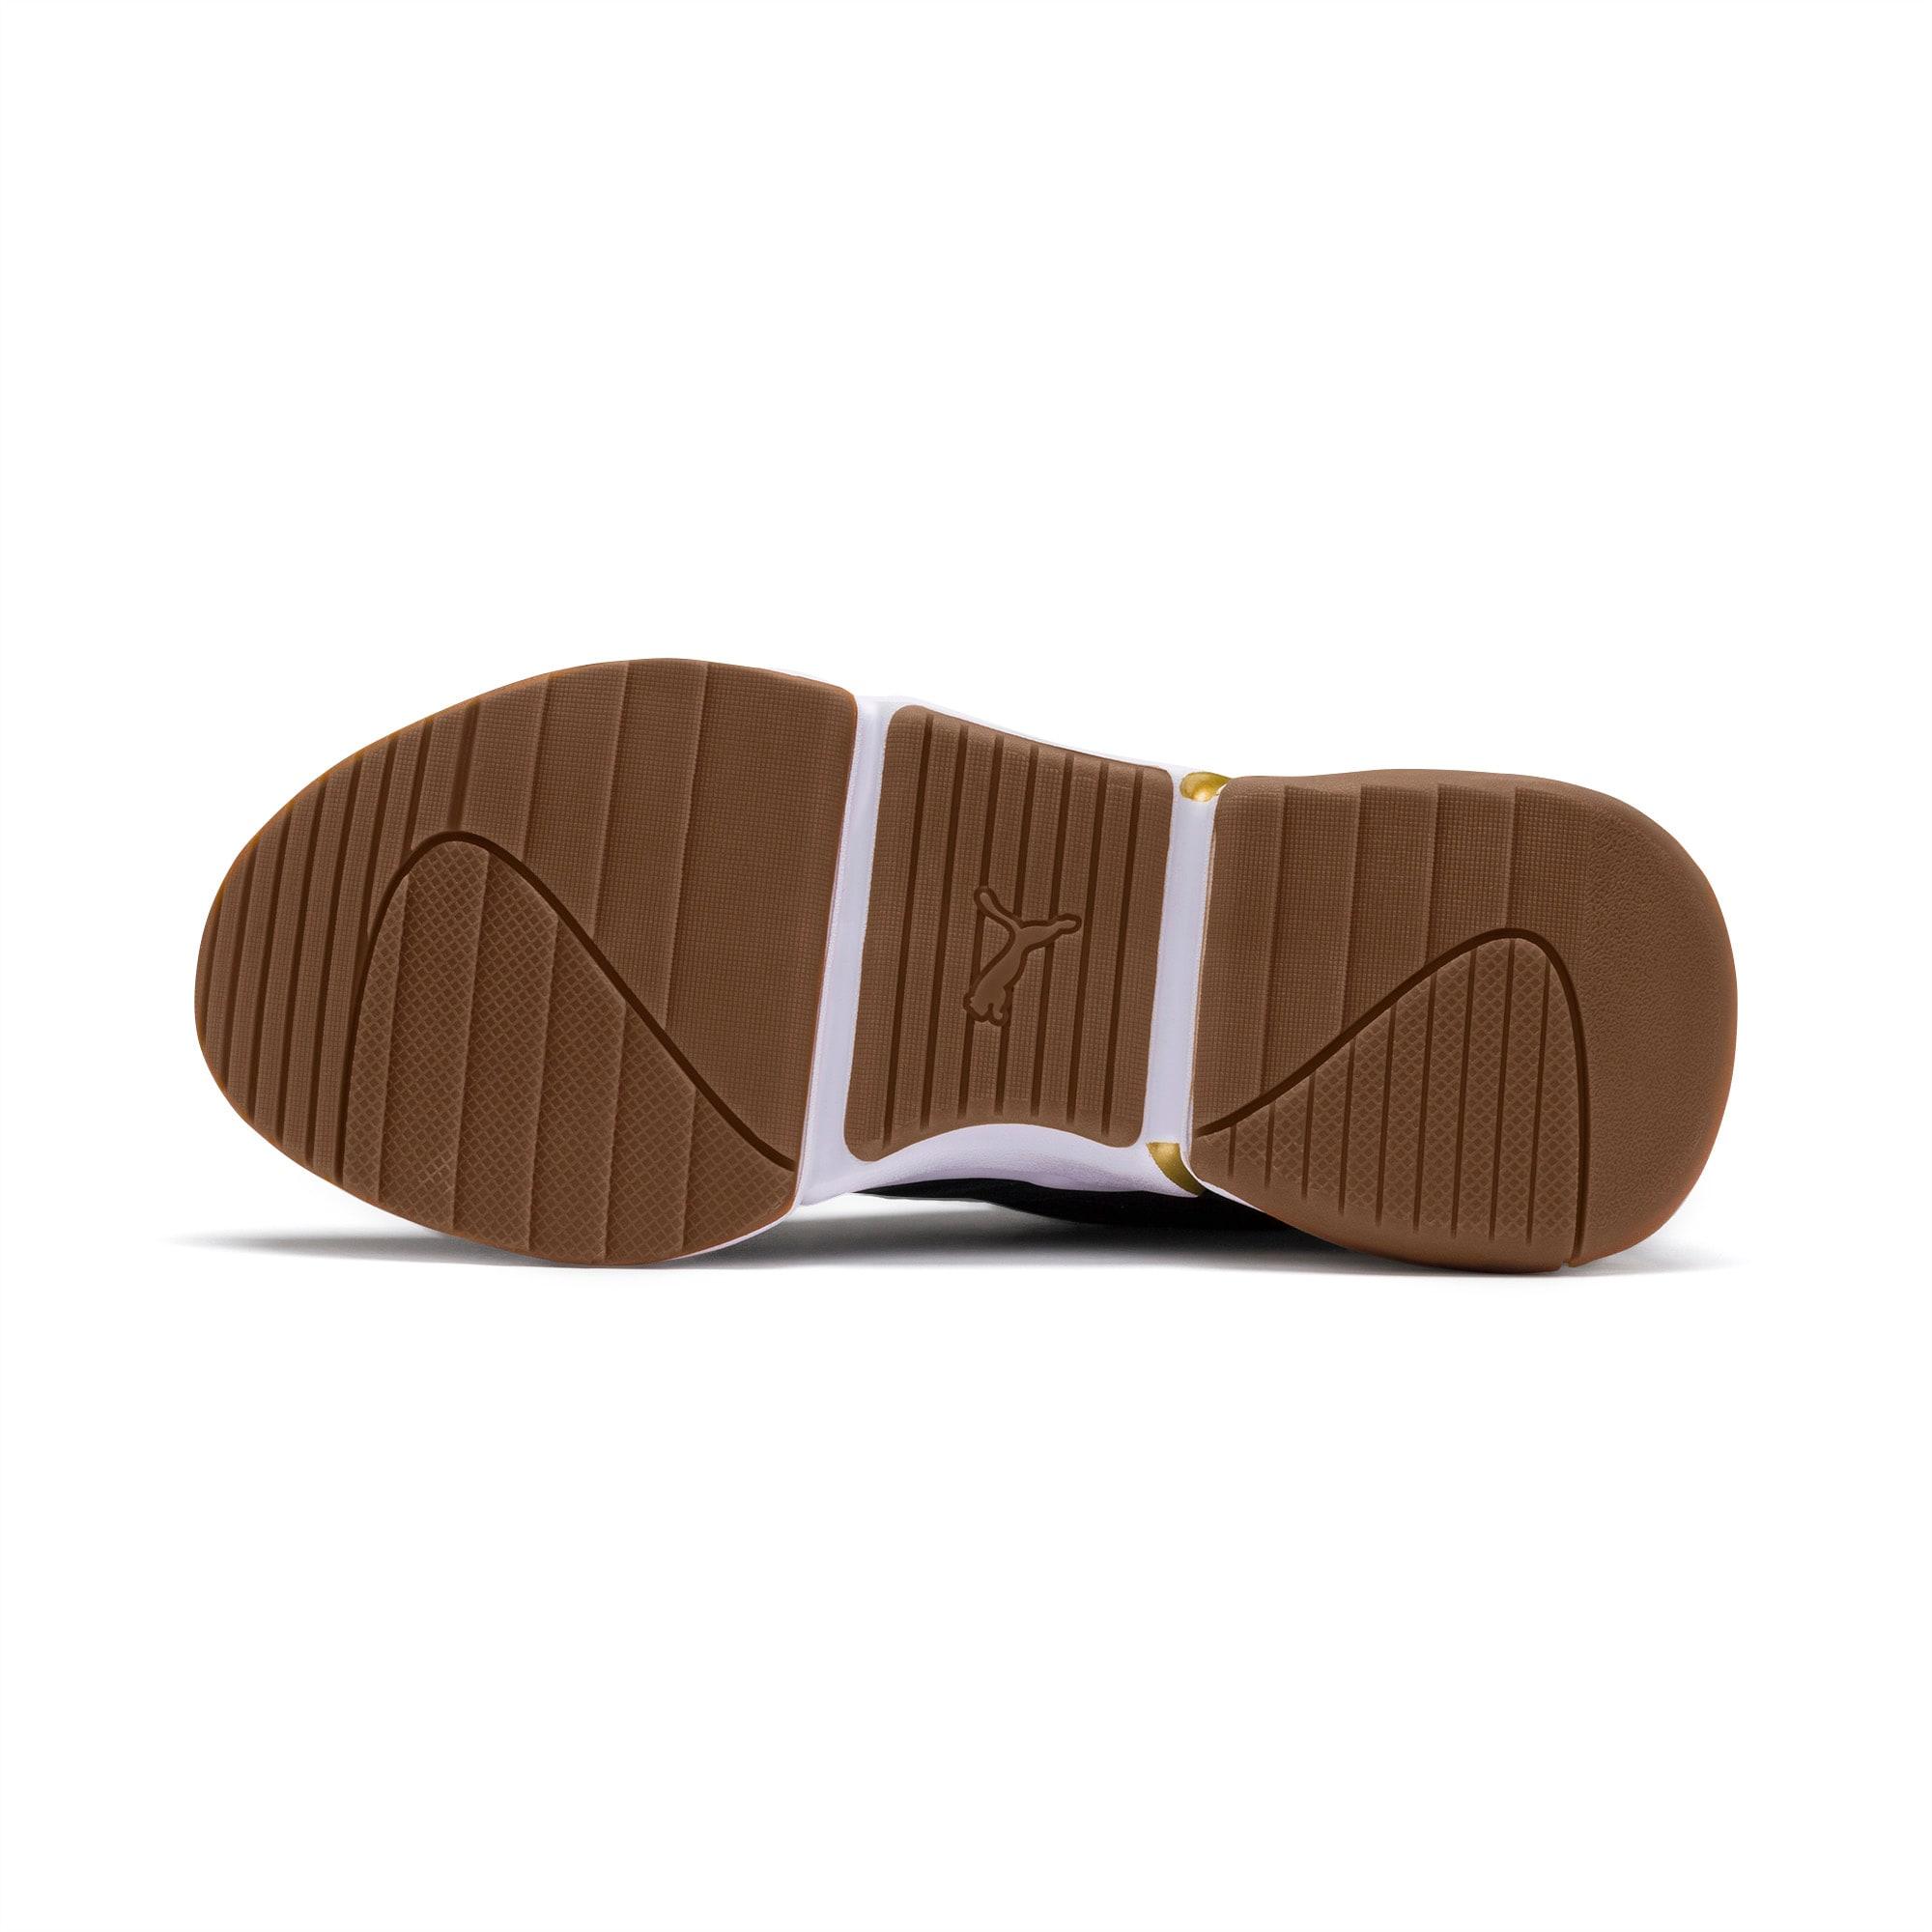 Damskie skórzane obuwie sportowe Nova V